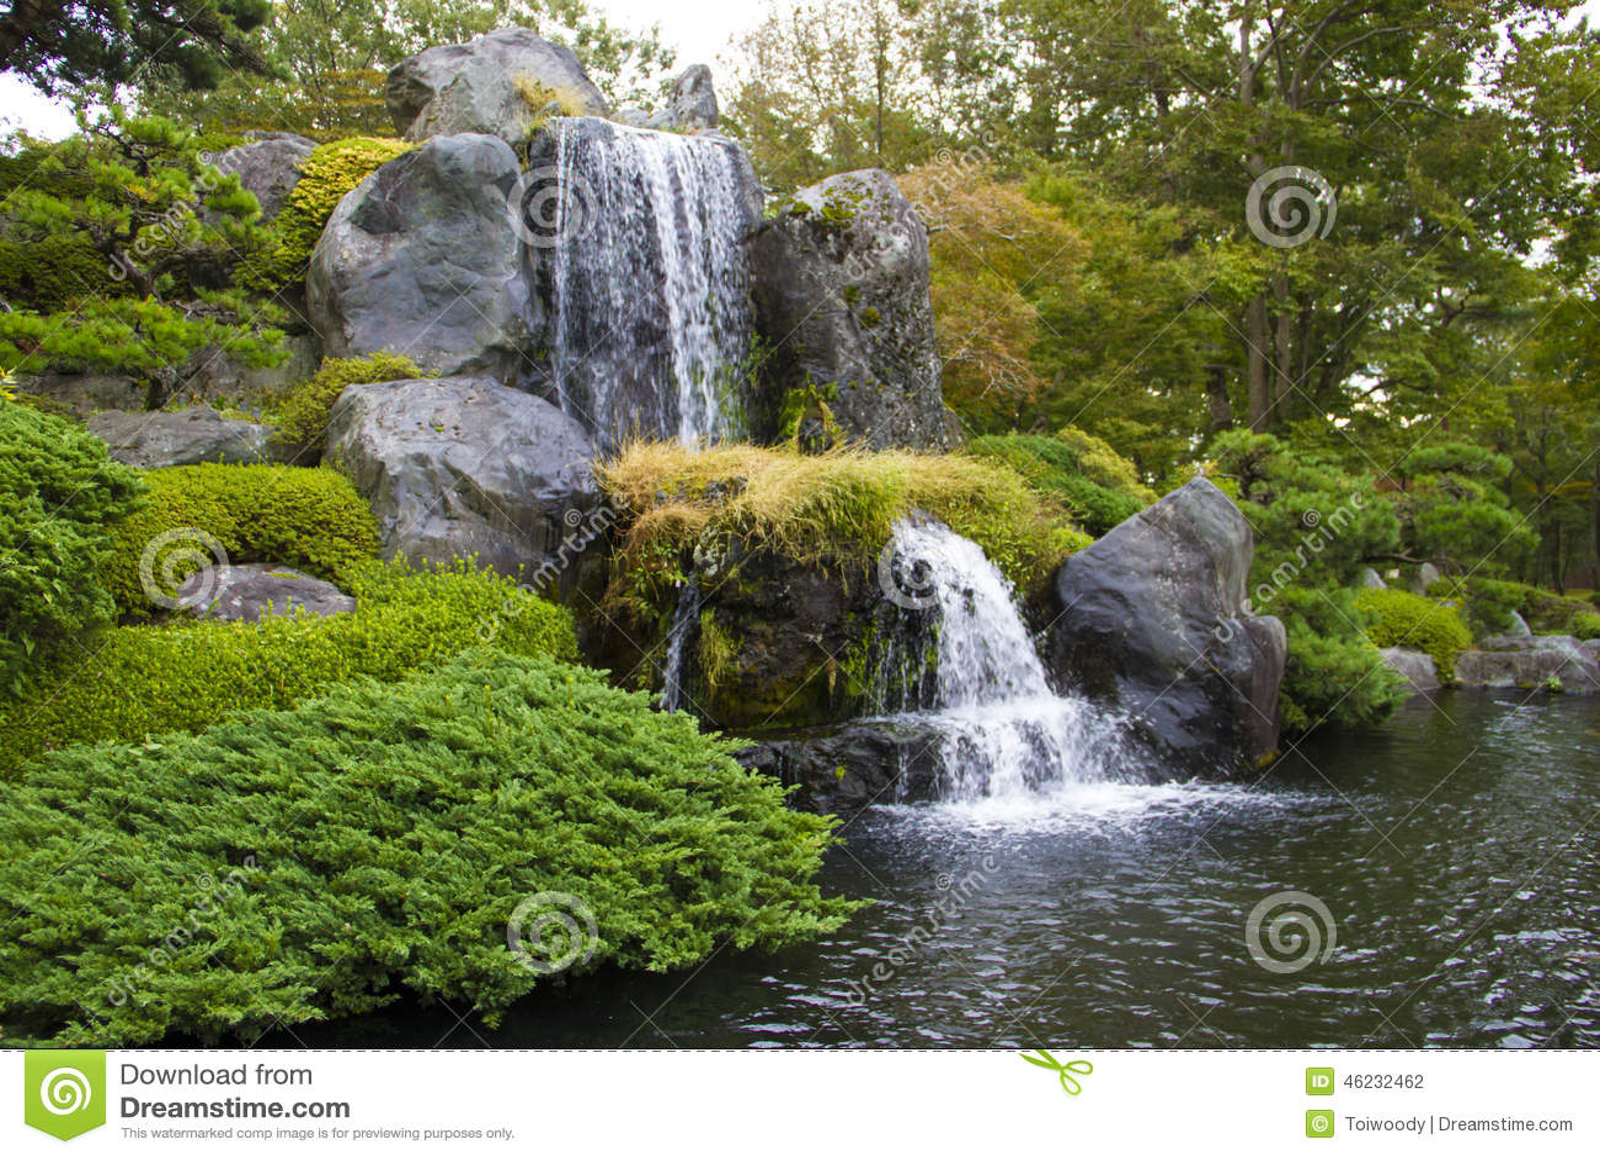 Waterval In Tuin : Waterval in tuin gratis afbeeldingen bos waterval bloem rivier vijver